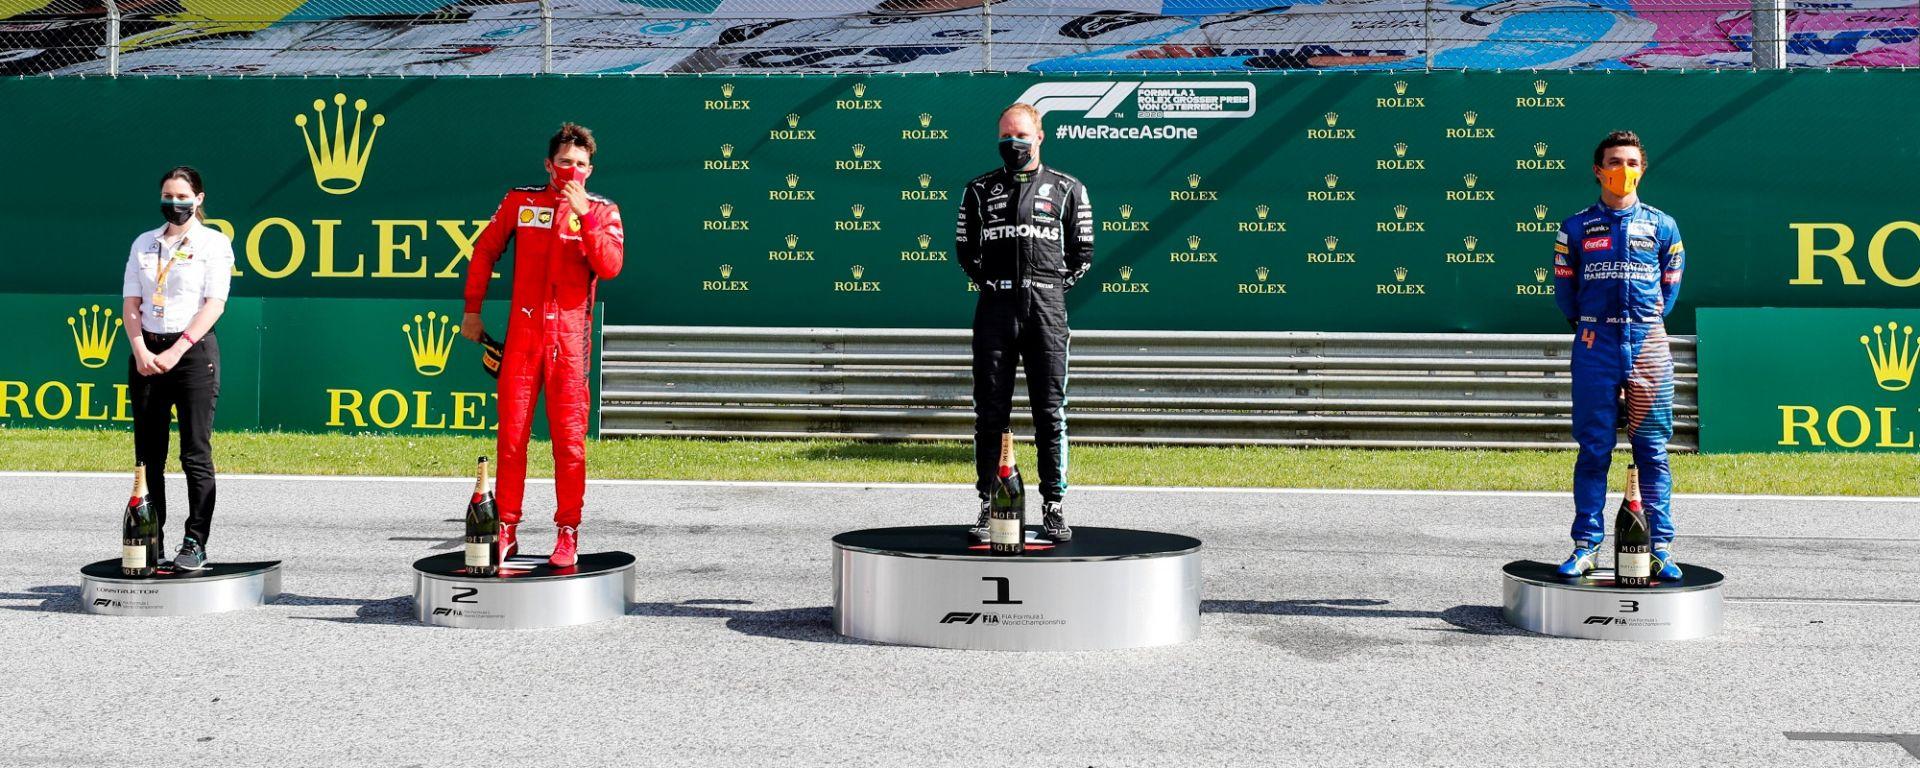 GP Austria 2020, Spielberg: il podio con Leclerc (Ferrari), Bottas (Mercedes) e Norris (McLaren)